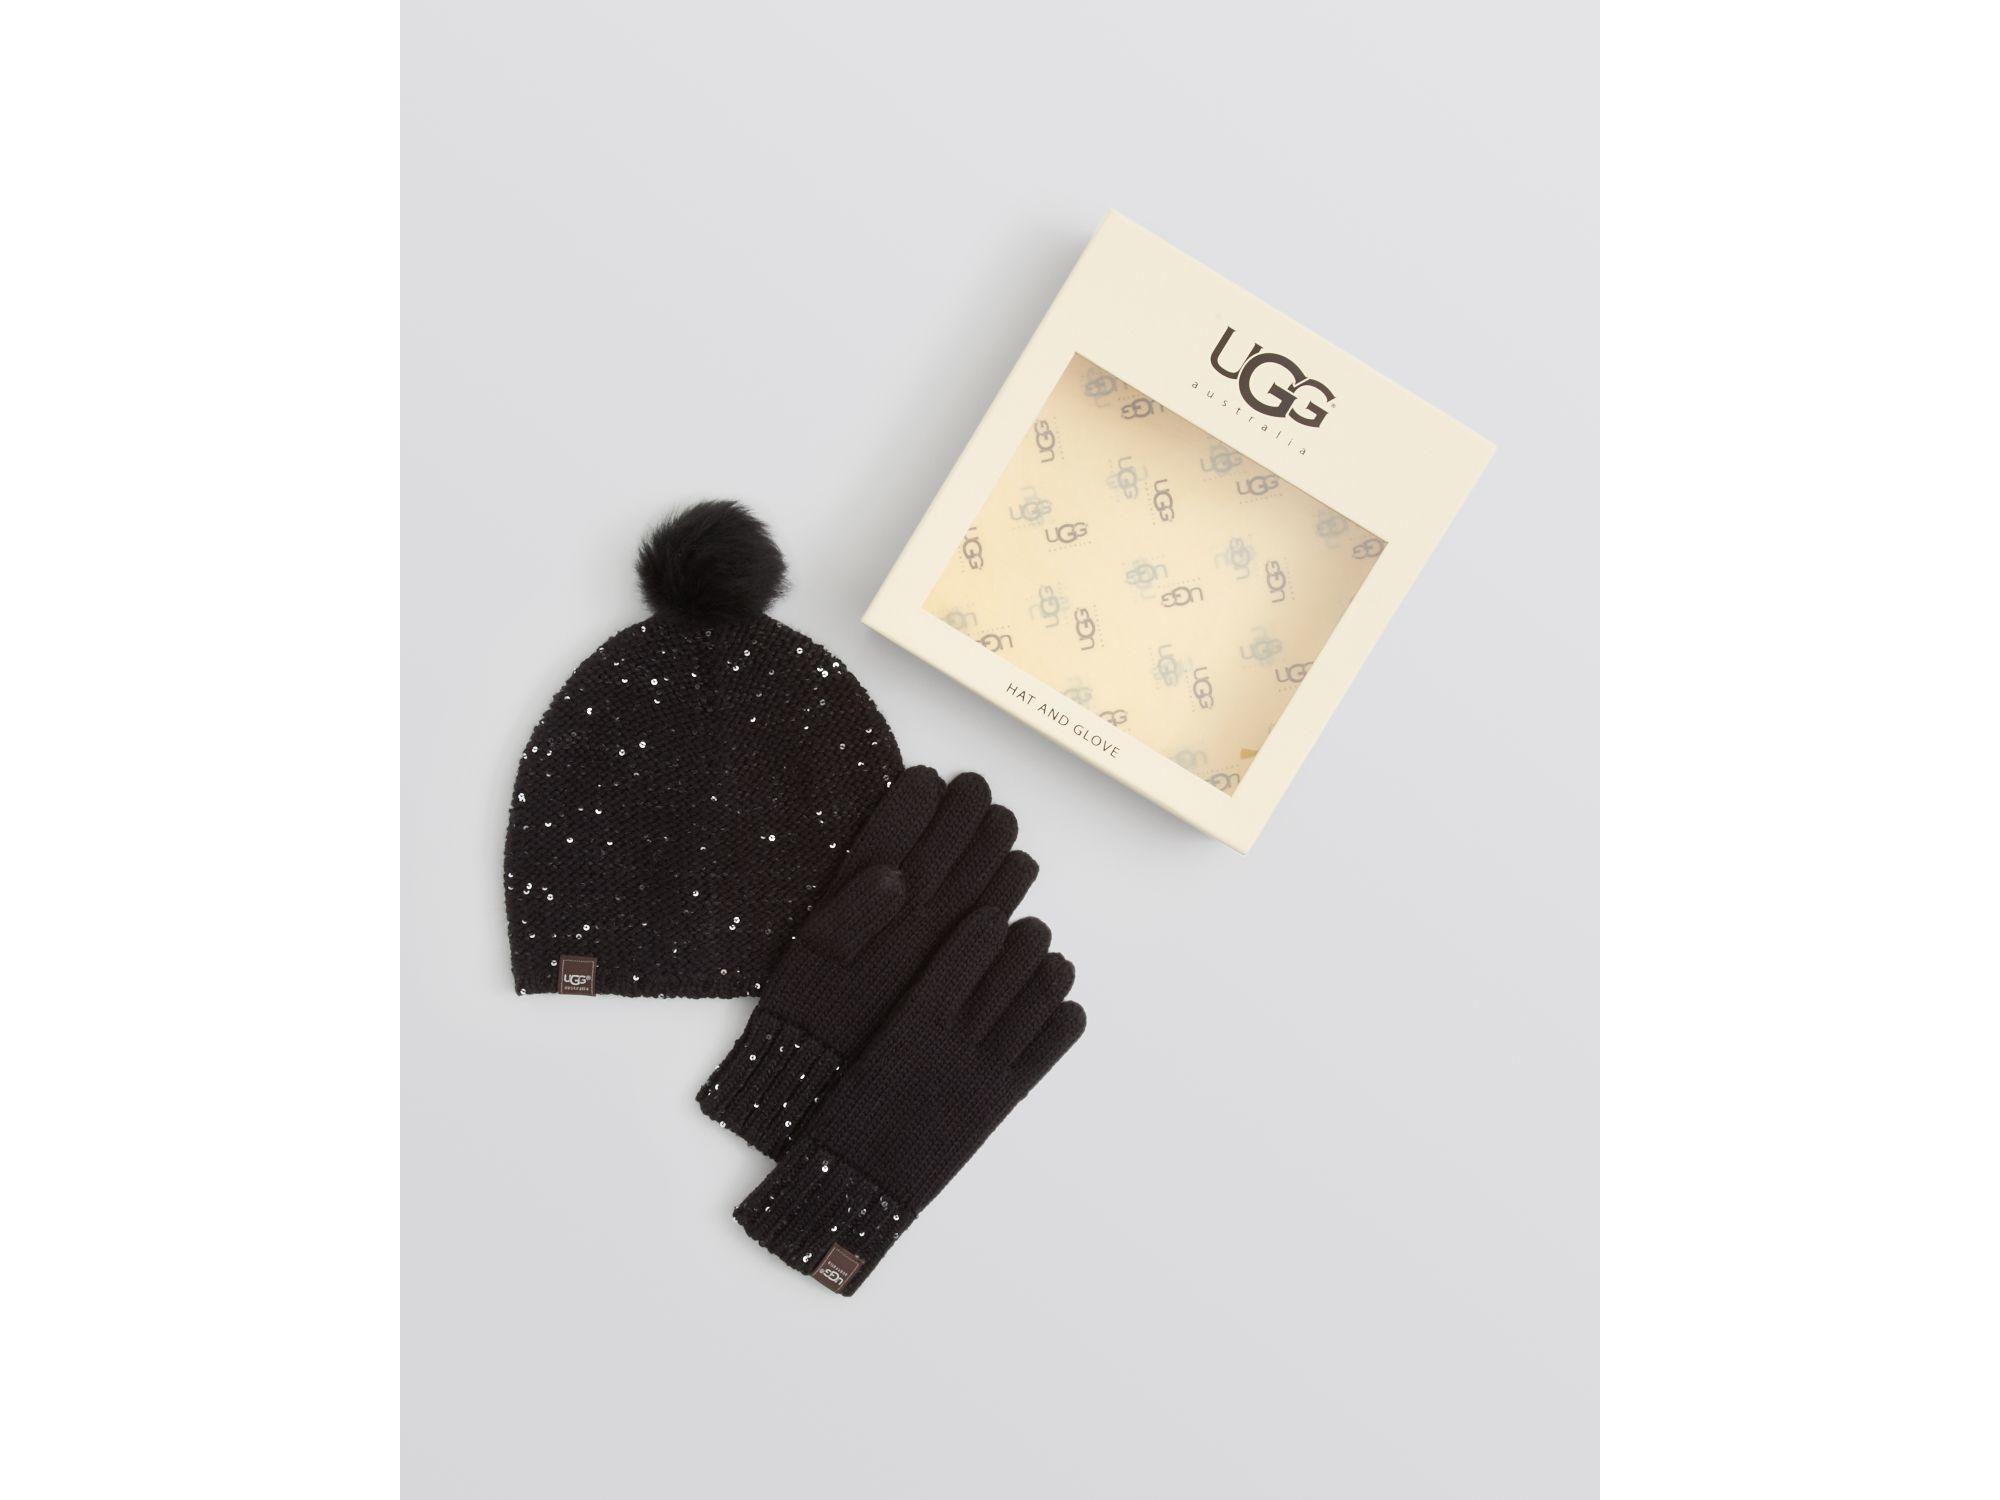 351a1c66c4f35 UGG Ugg® Australia Lyla Sequin Beanie   Gloves Box Set in Black - Lyst